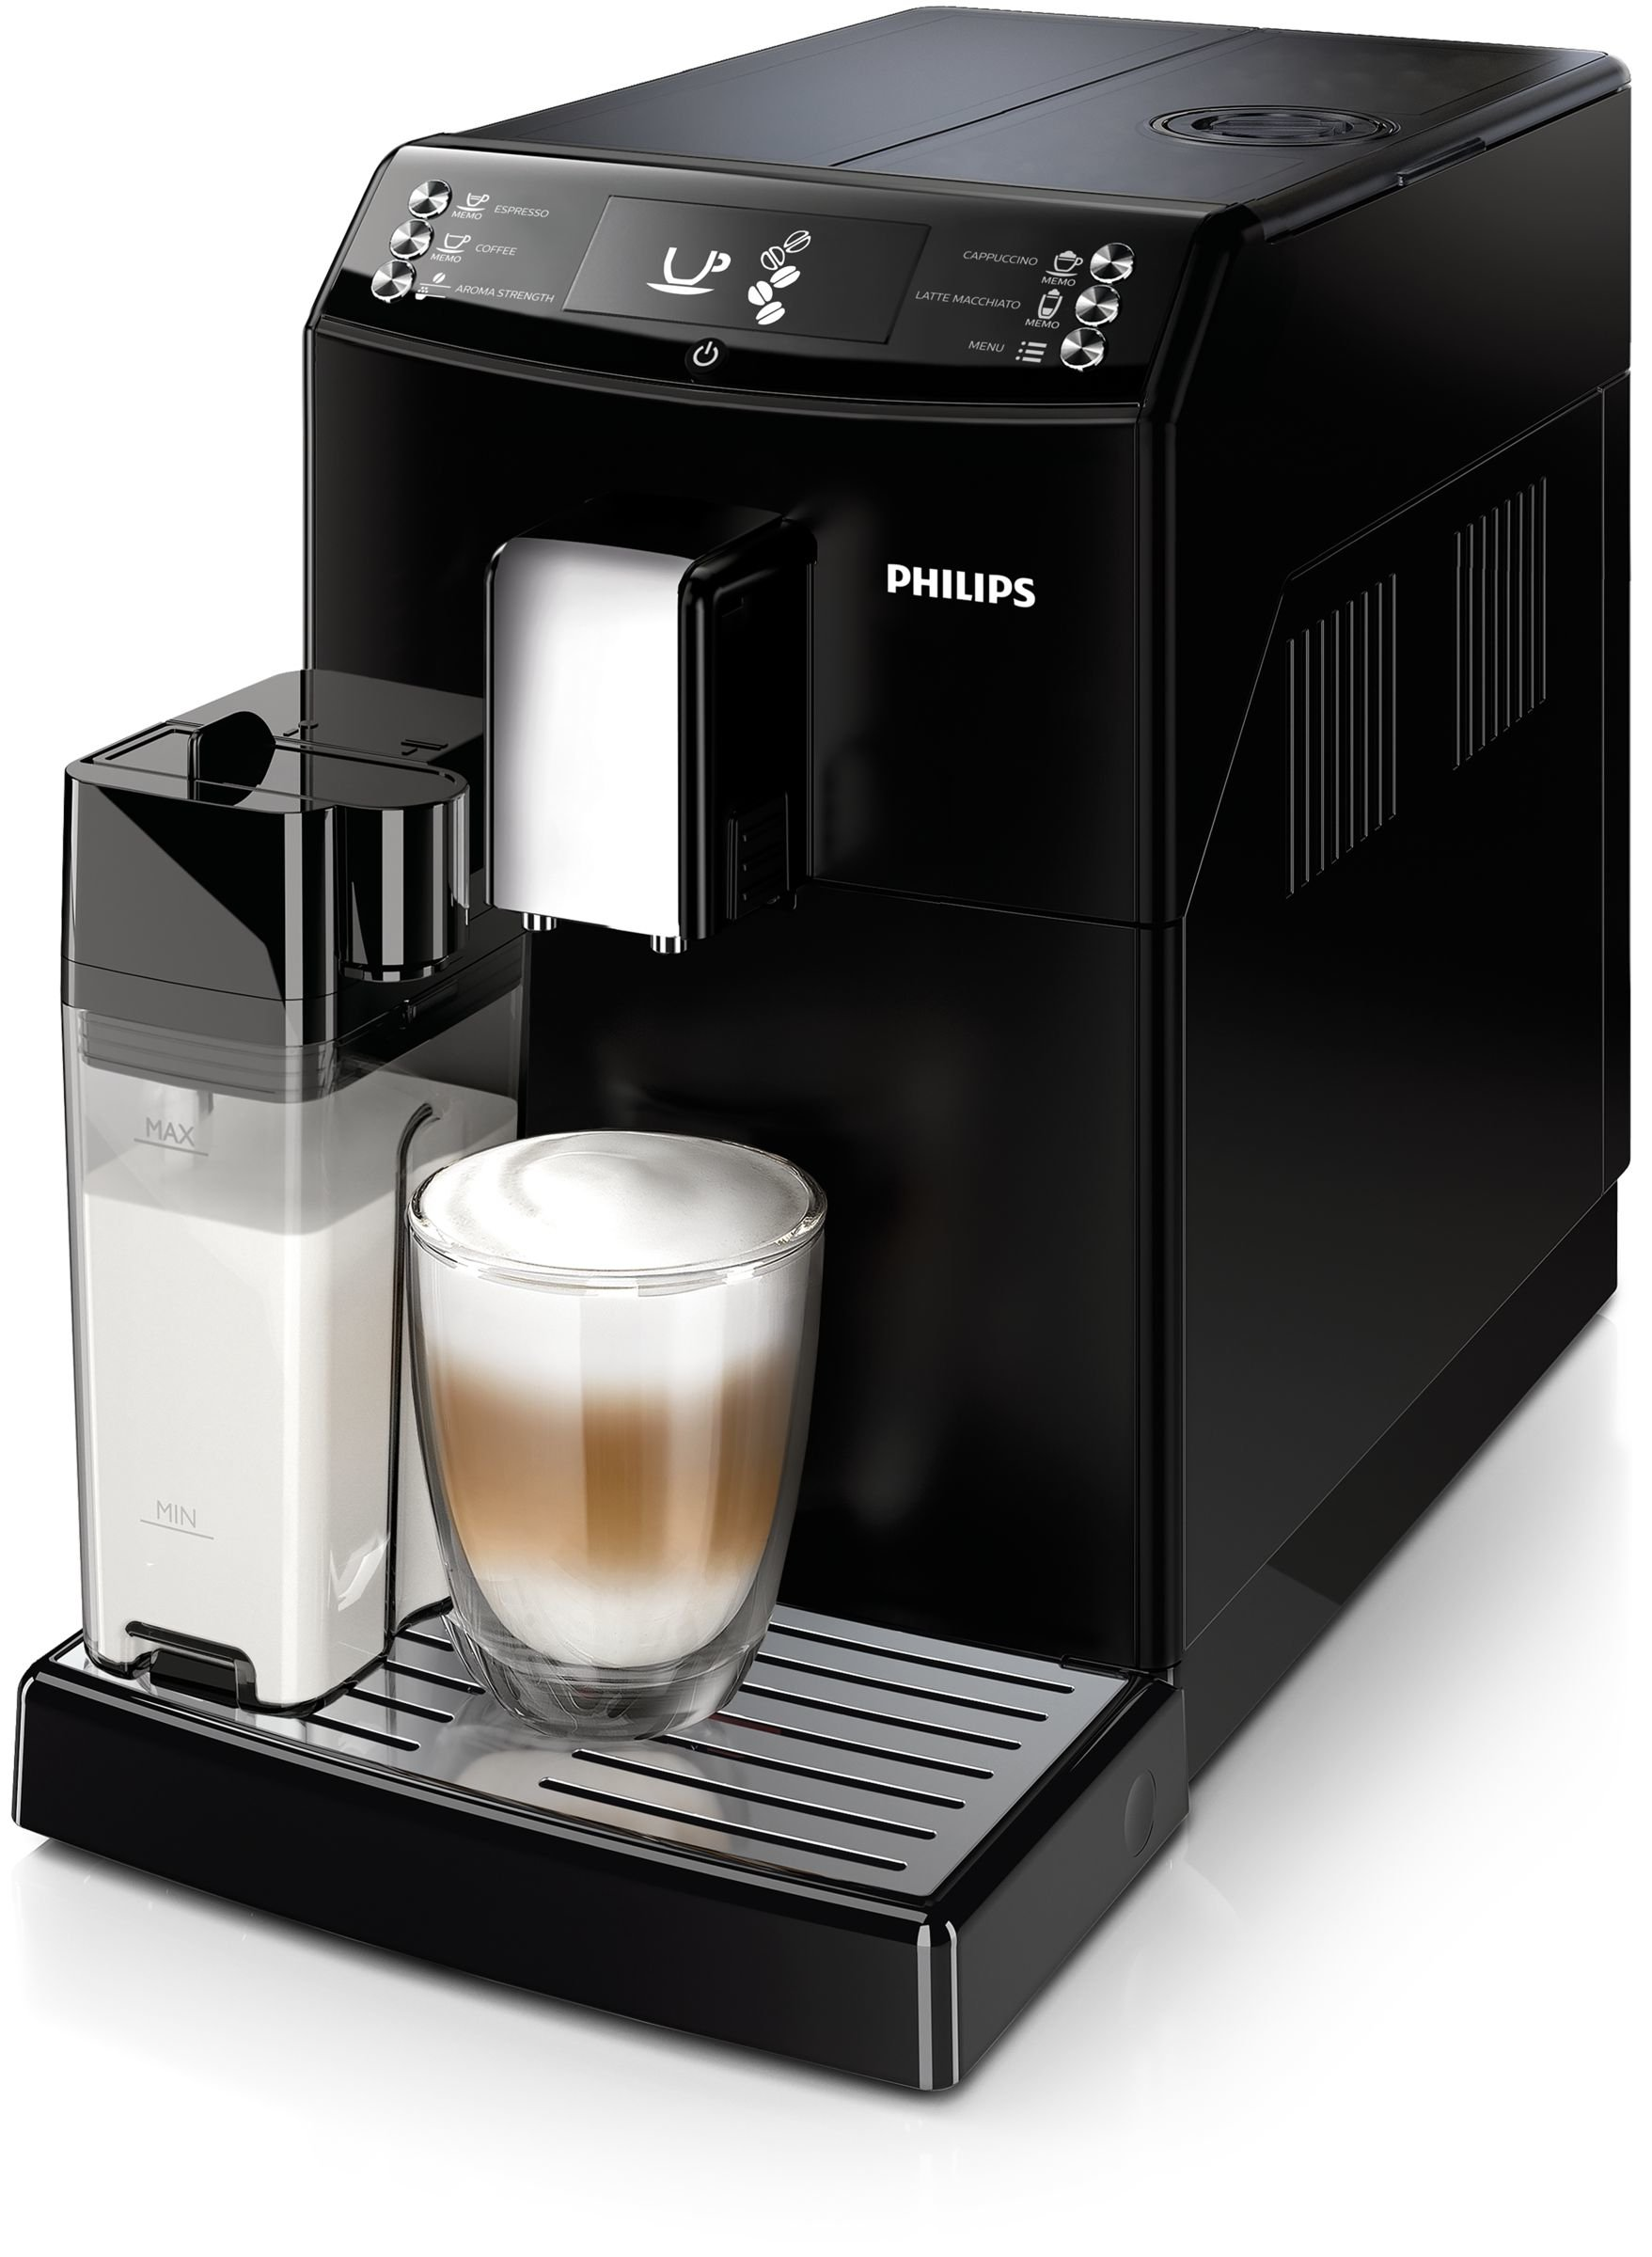 Philips-EP-355100-EP355100-Kaffeevollautomat-Polycarbonate-18-liters-Schwarz